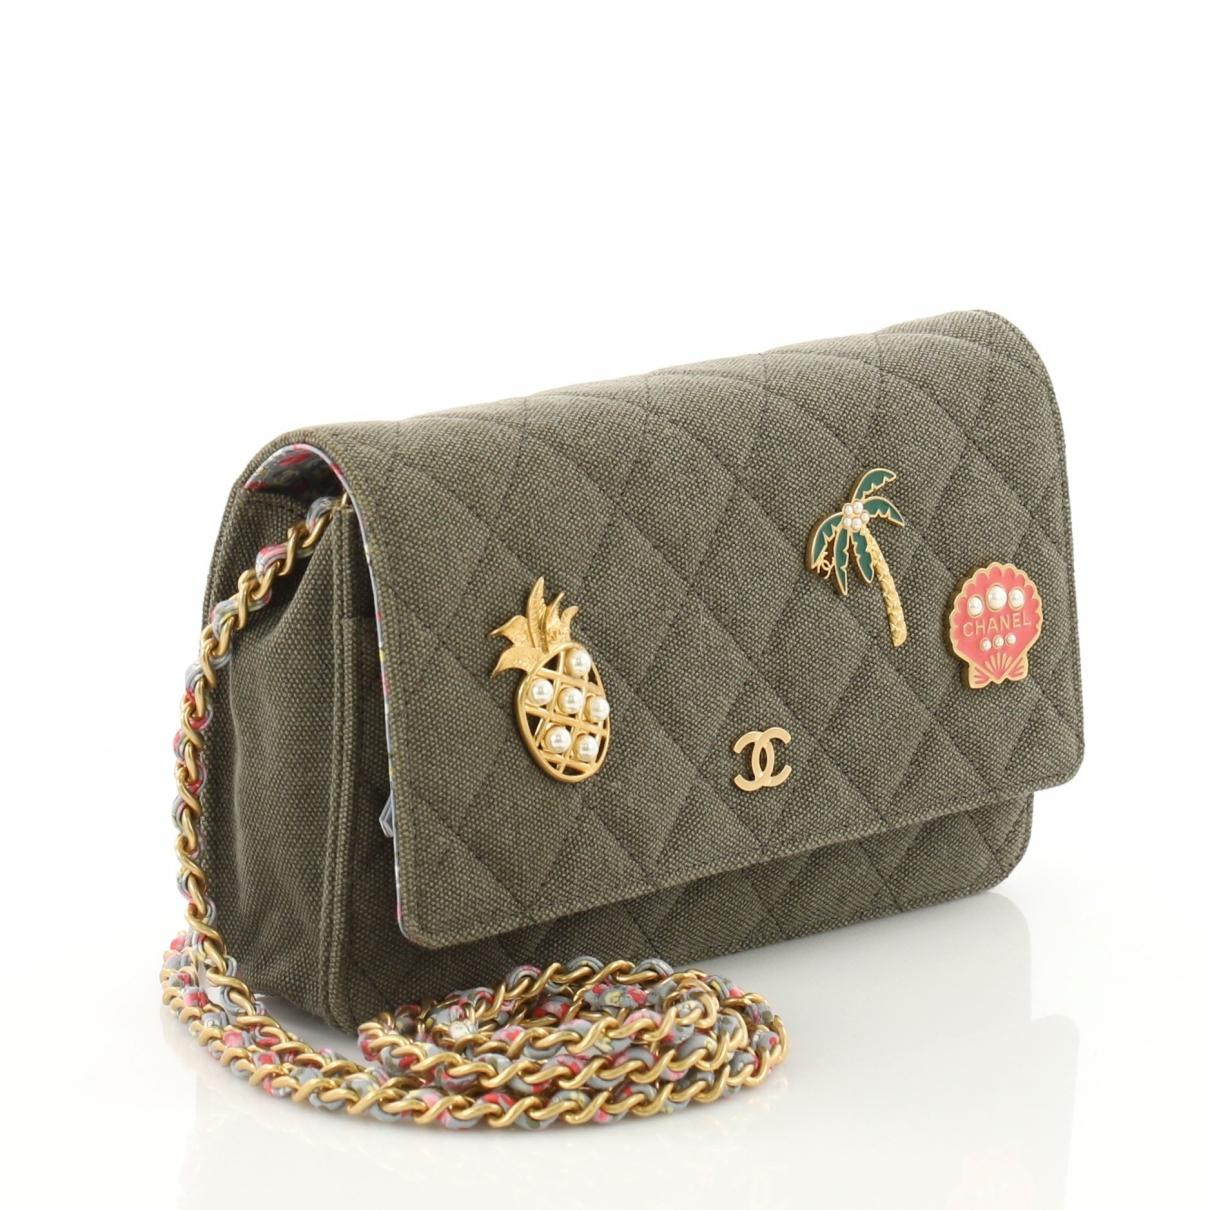 Chanel - Multicolor Pre-owned Wallet On Chain Khaki Cloth Handbags - Lyst.  View fullscreen 65e1034634393